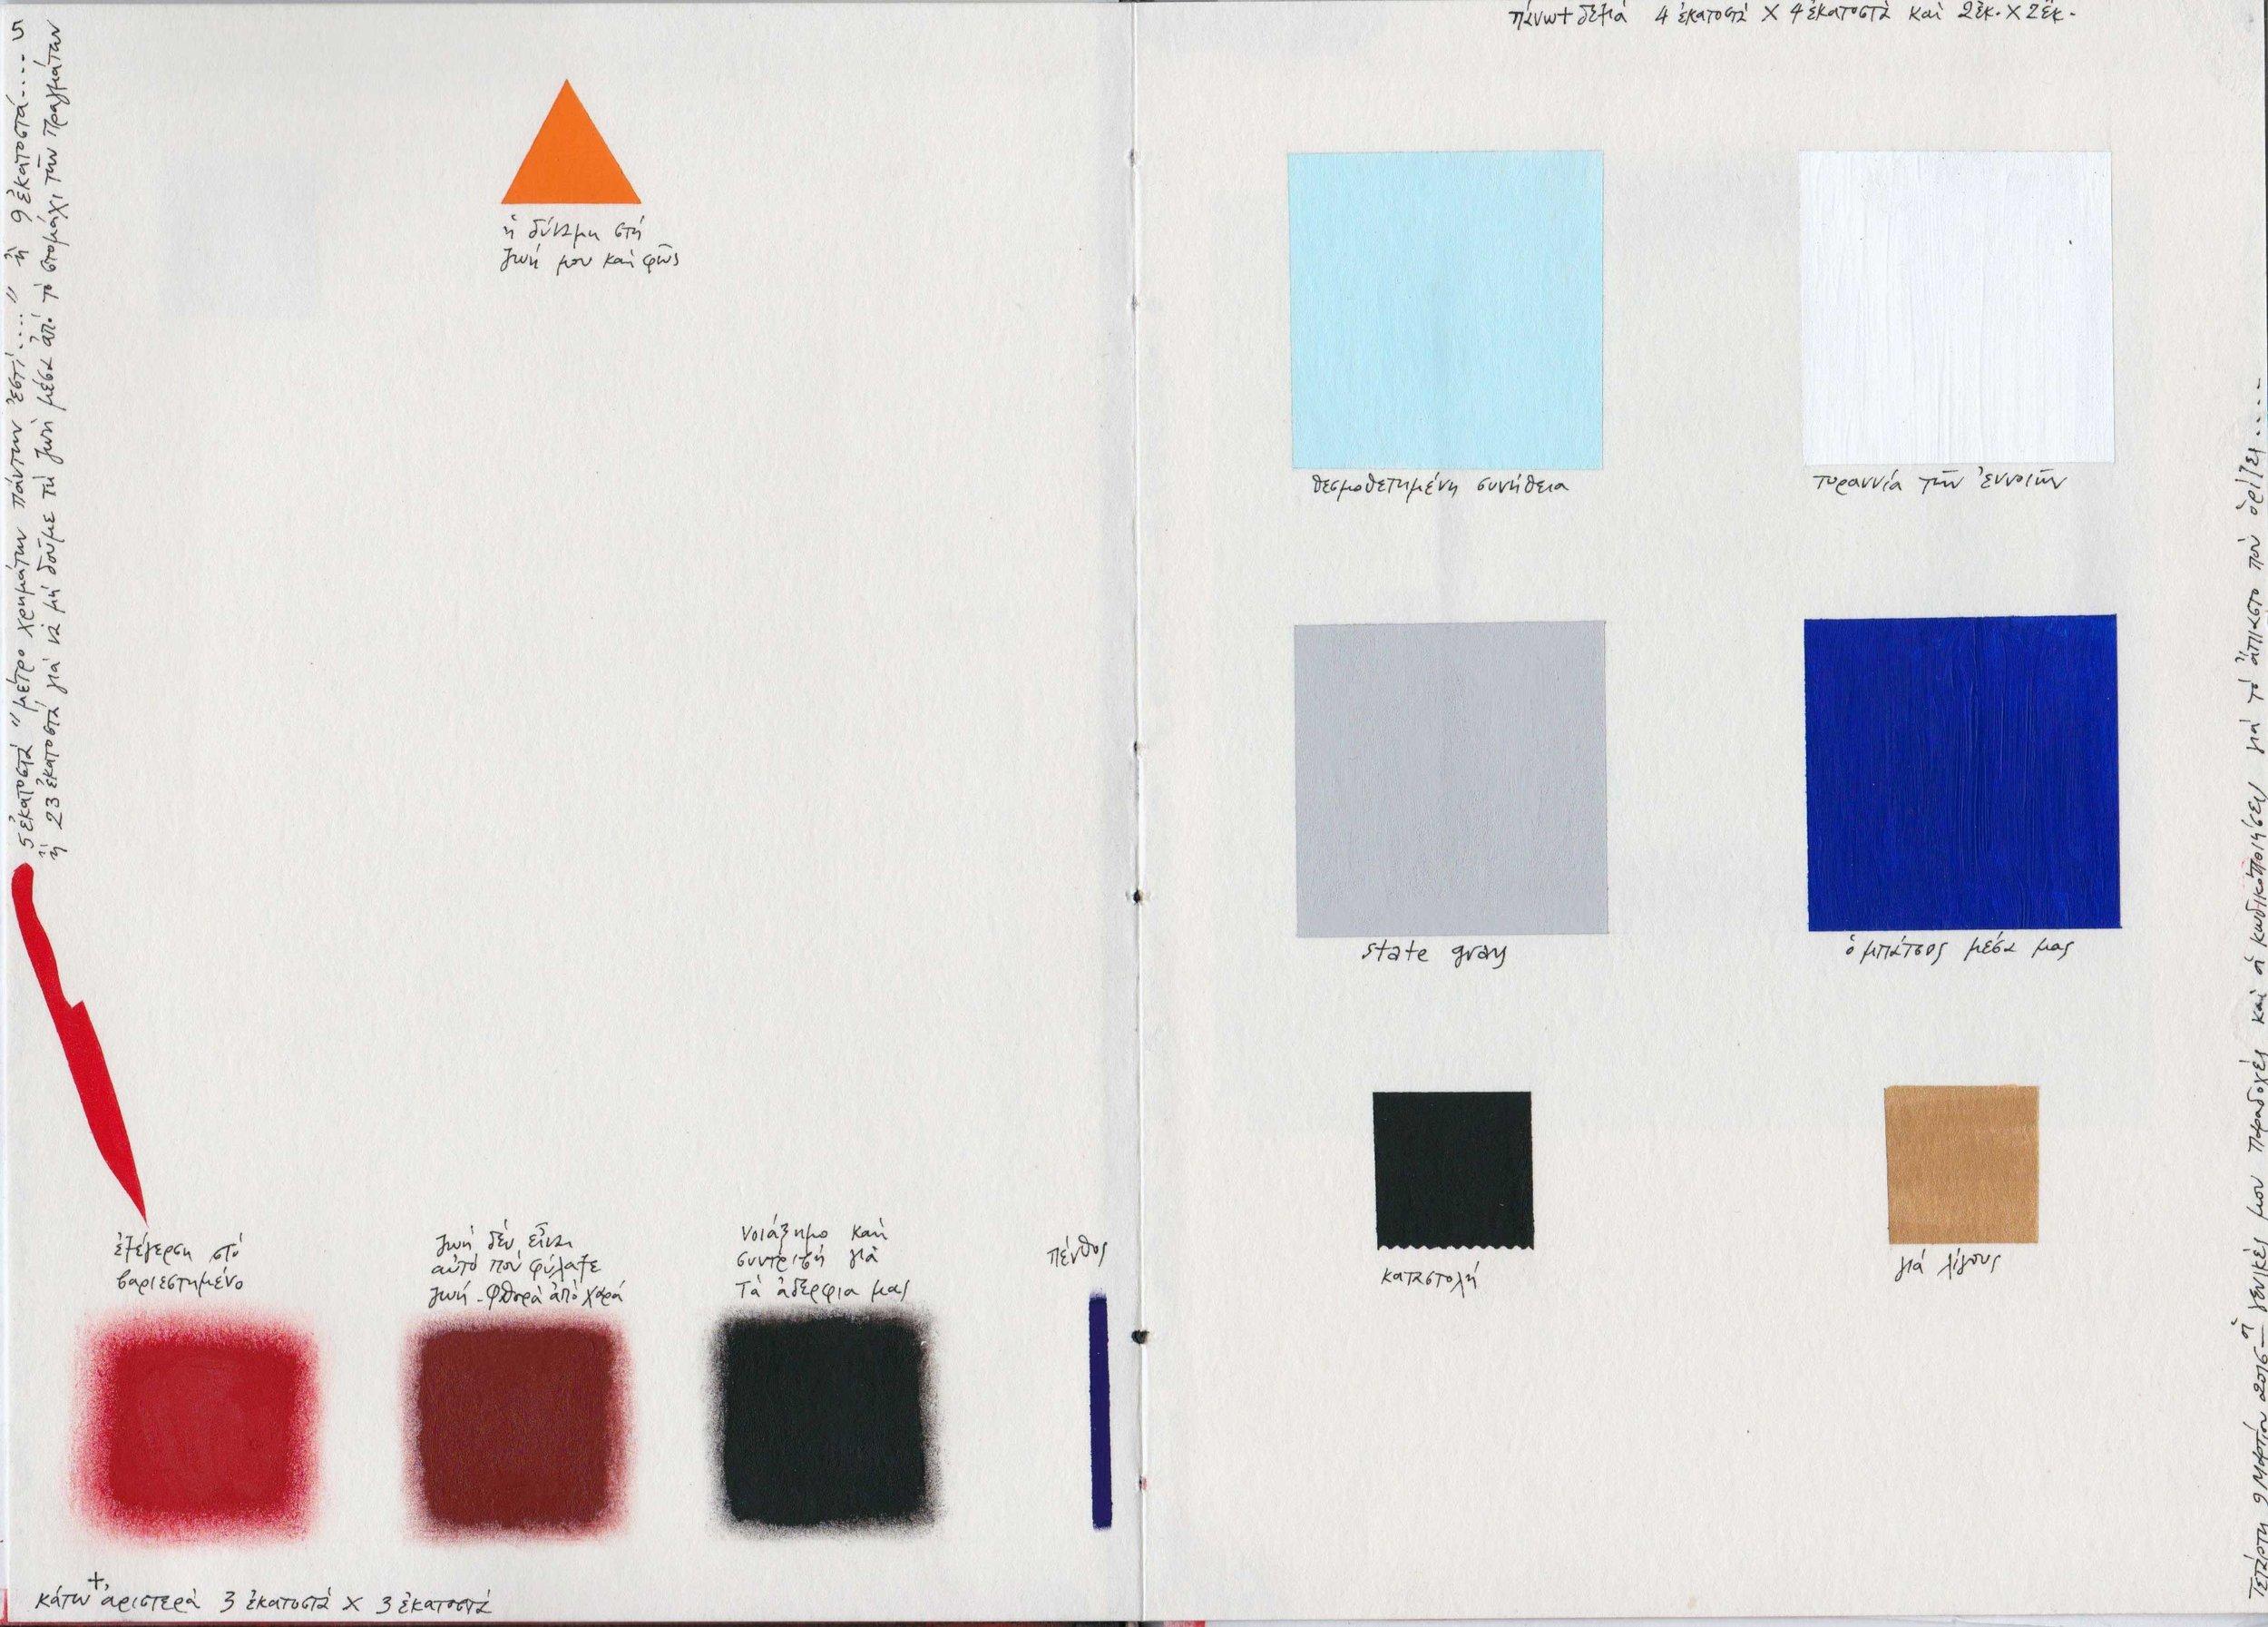 diary 19 page 5-6